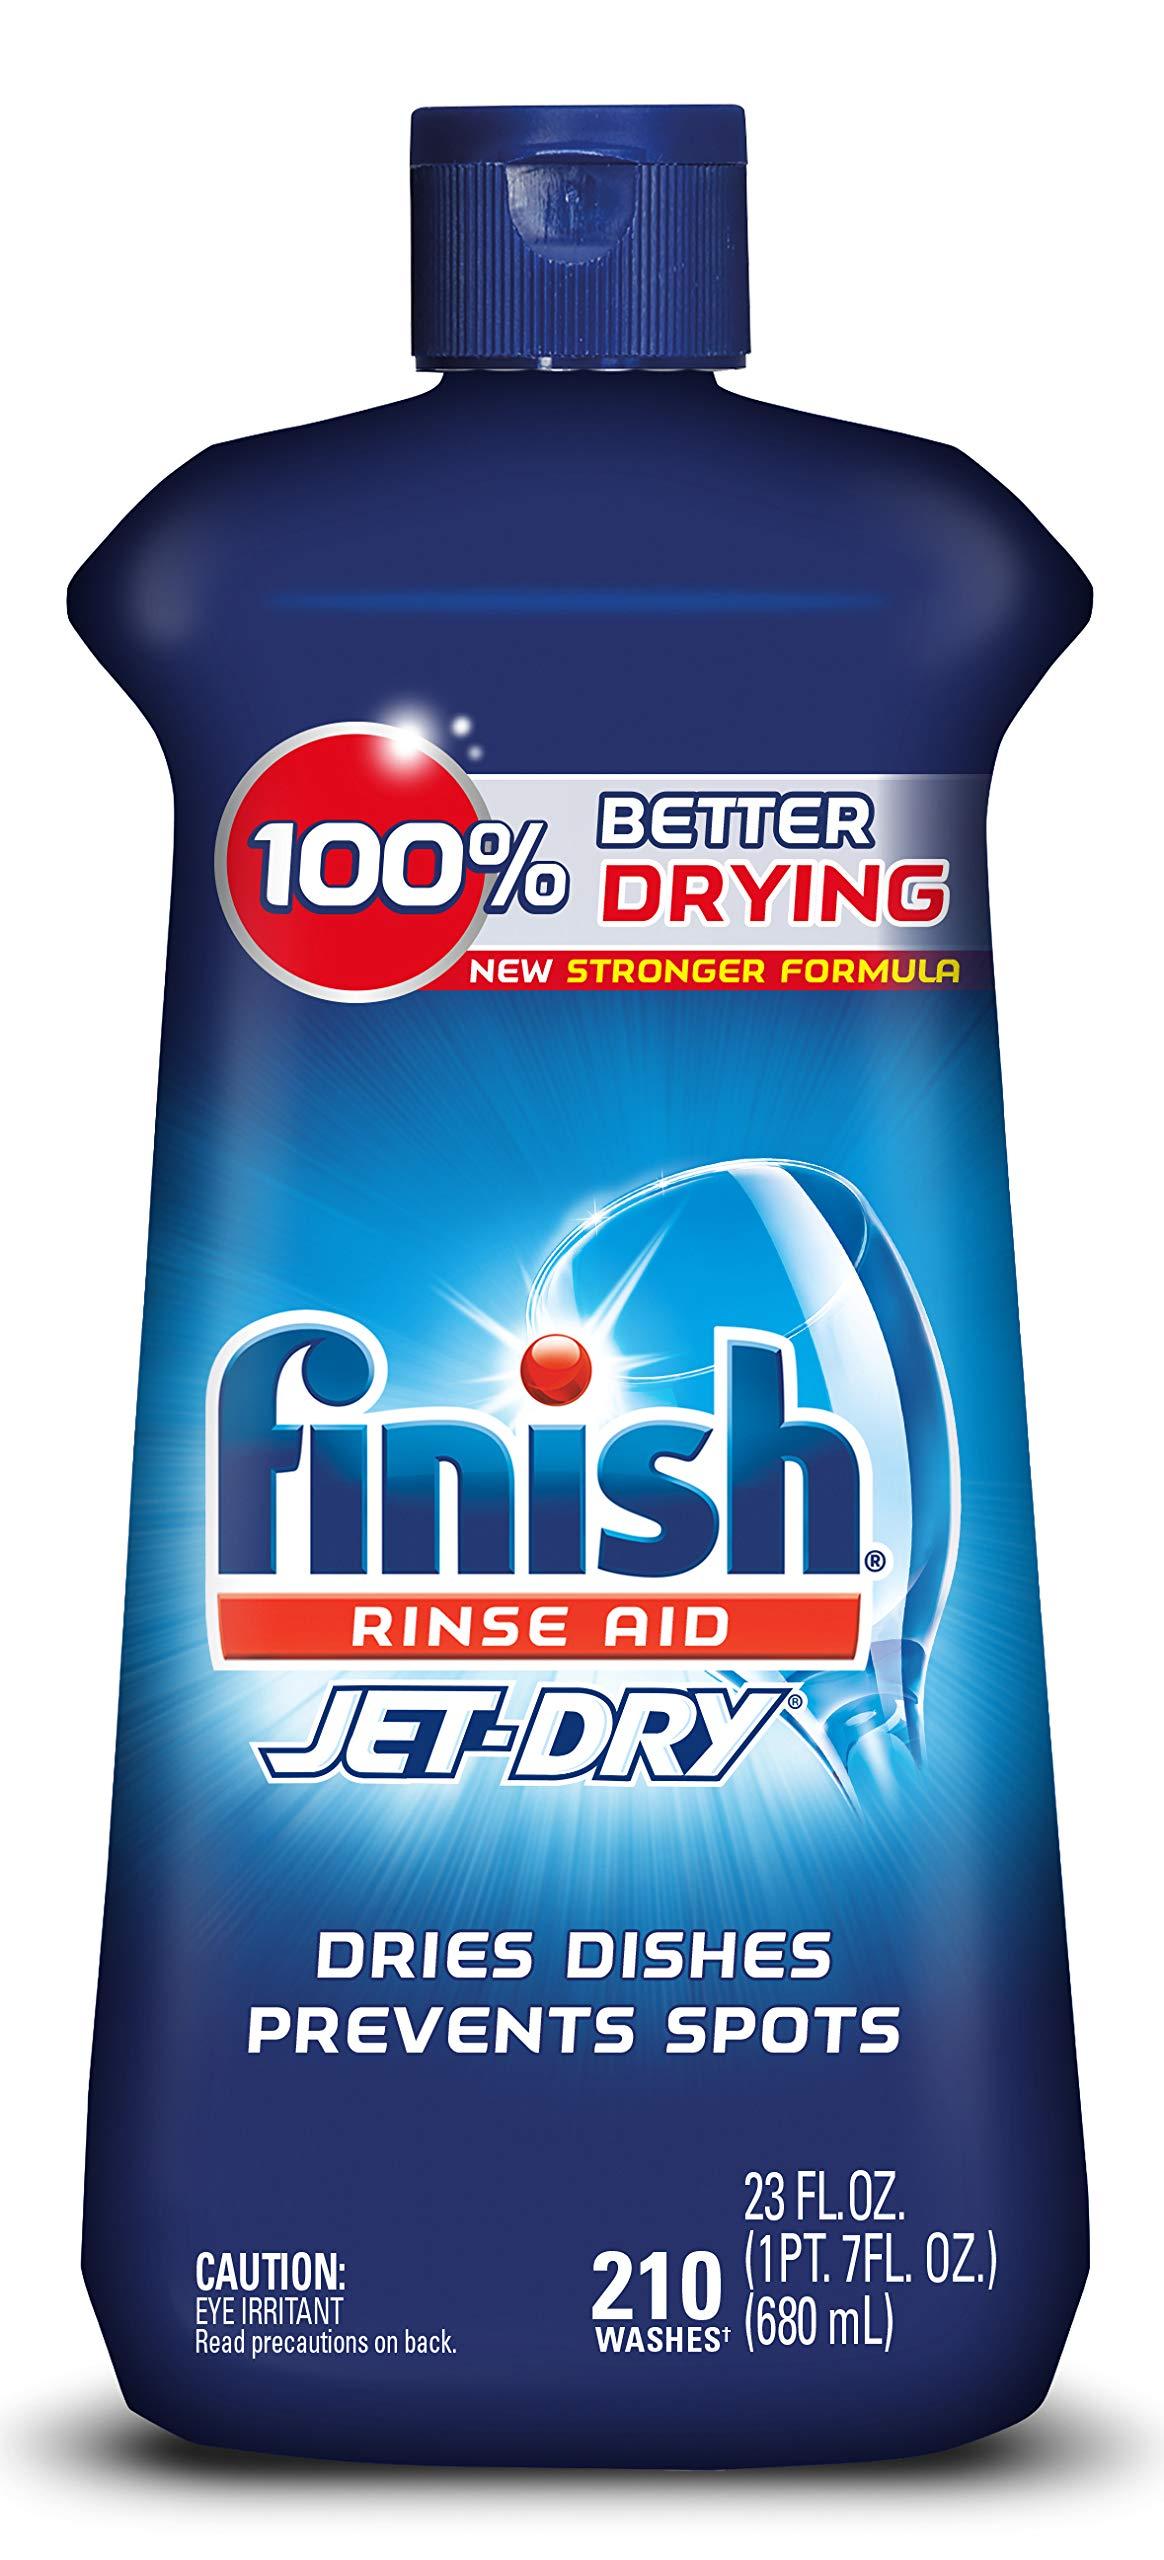 Finish Jet Dry Rinse Dishwasher Drying